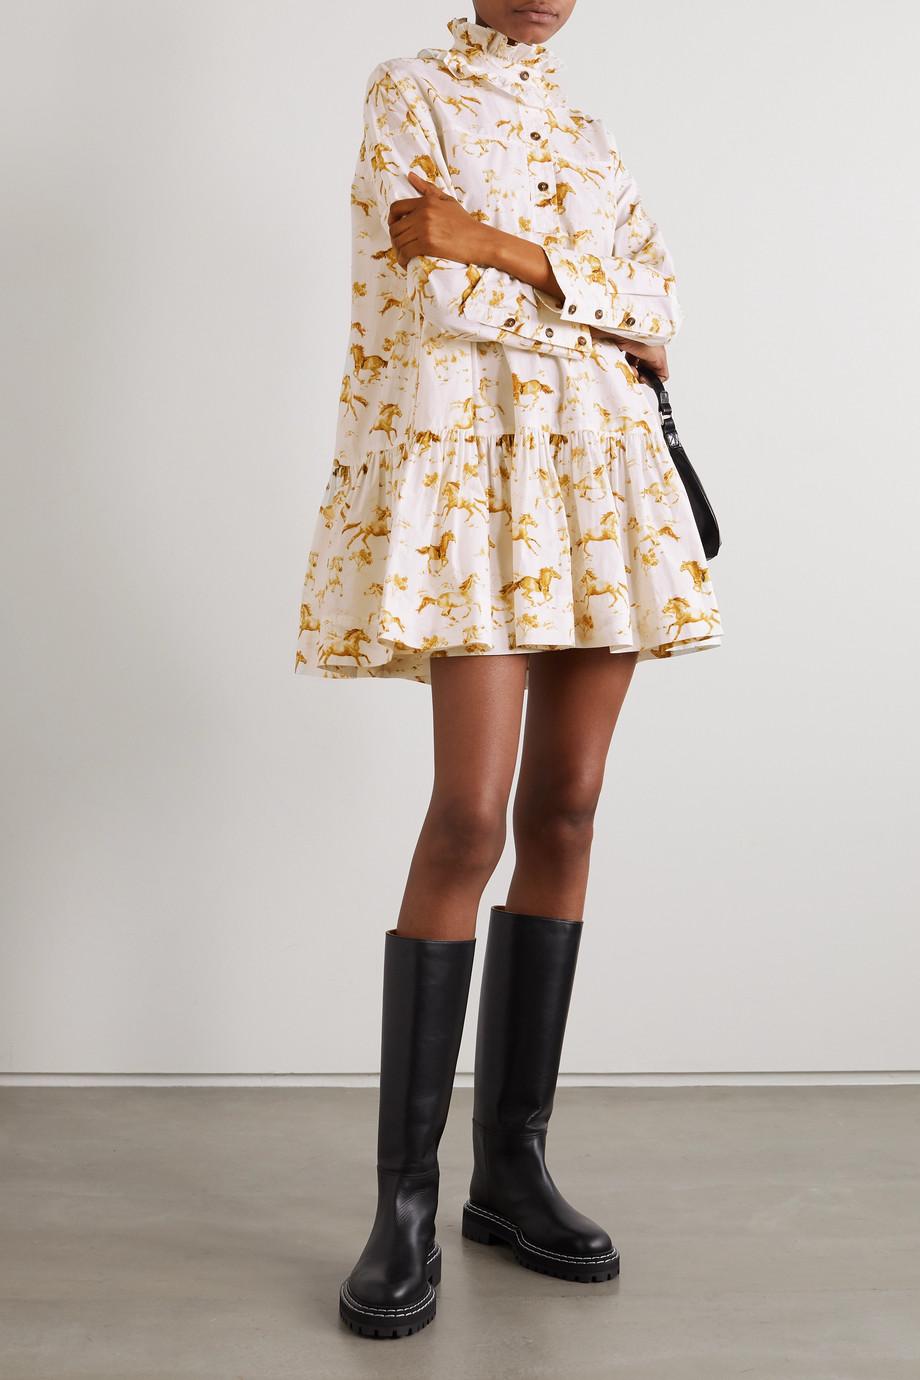 GANNI + NET SUSTAIN printed organic cotton-poplin mini dress